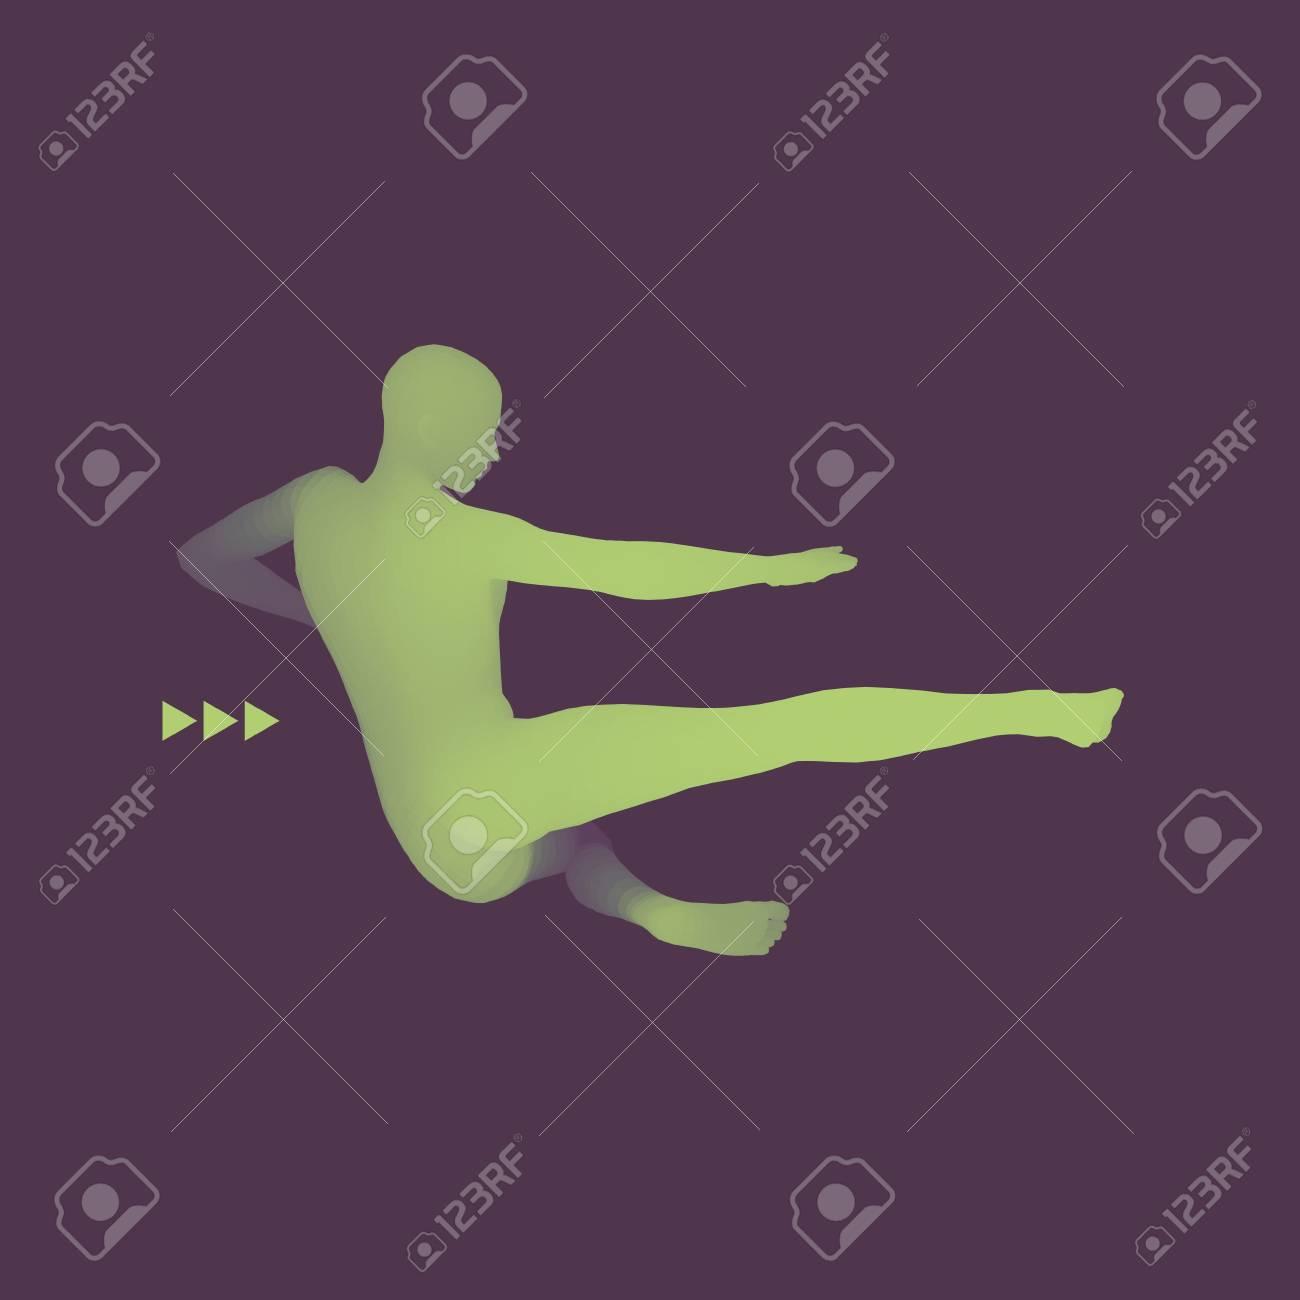 Fighter  Sports concept  3D Model of Man  Human Body  Sport Symbol